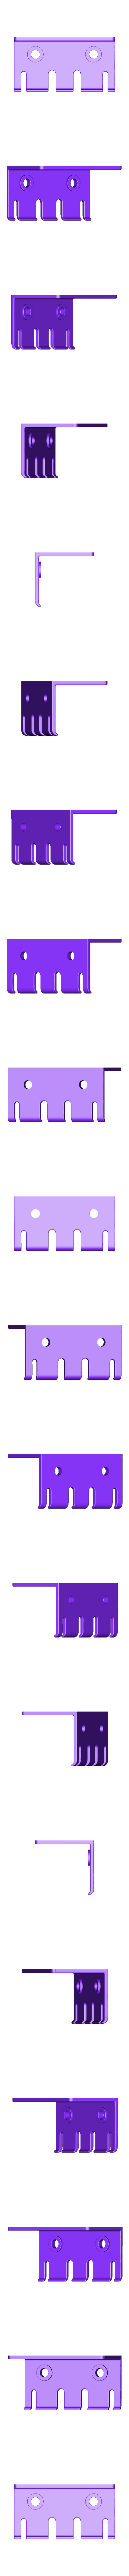 Screws.stl Download free STL file Premium Screwdriver Set 6pcs Wall Mount 060 I for screws or peg board • 3D printing template, Wiesemann1893